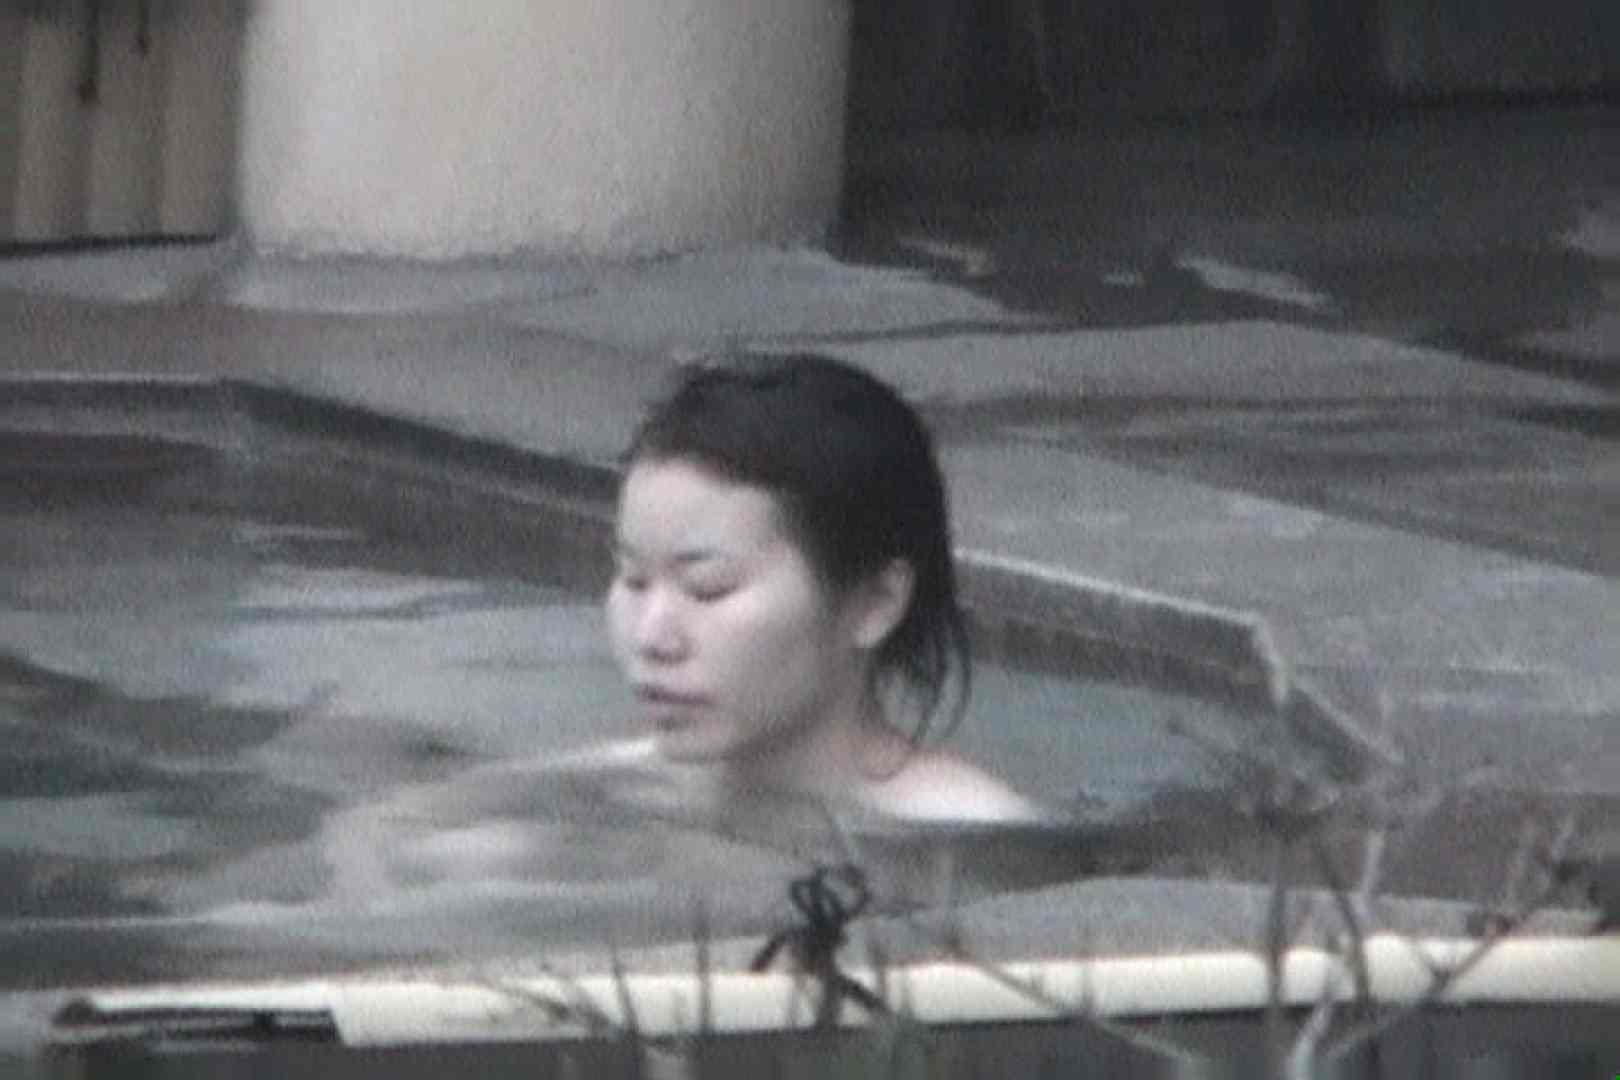 Aquaな露天風呂Vol.556 露天風呂編 | 盗撮シリーズ  99PIX 87